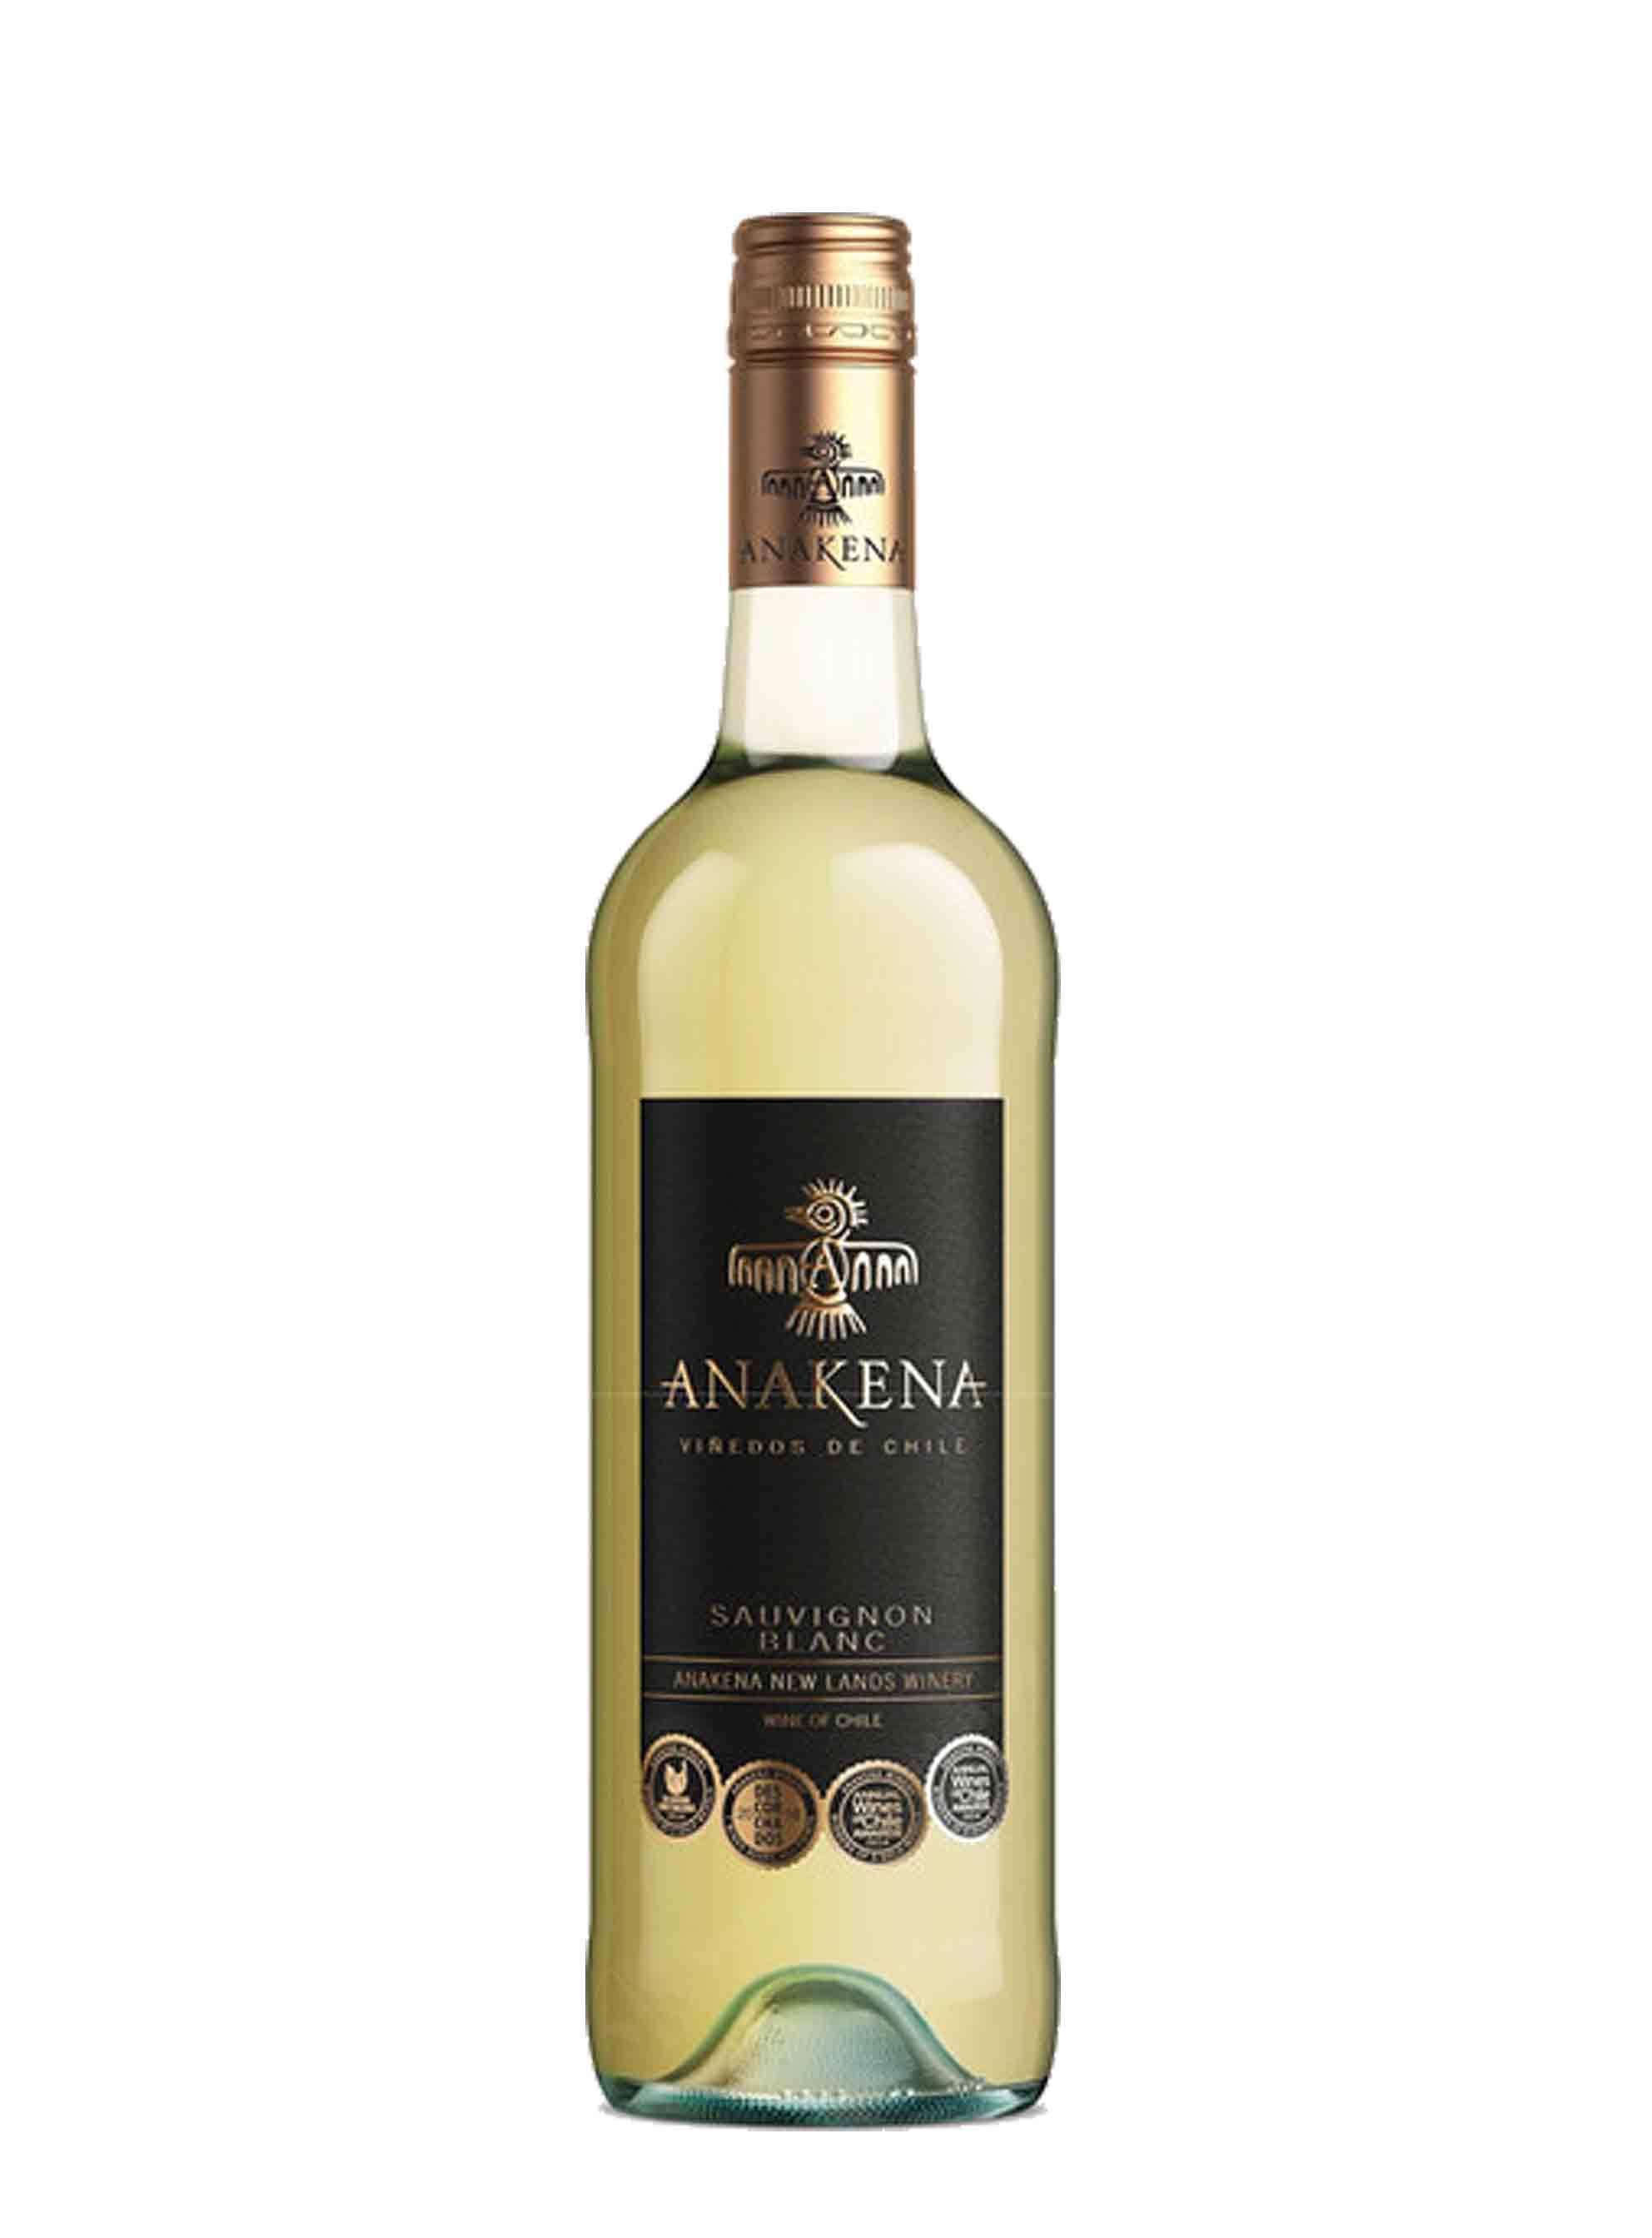 Sauvignon Blanc, 2015, Anakena Winery, 0.75 l